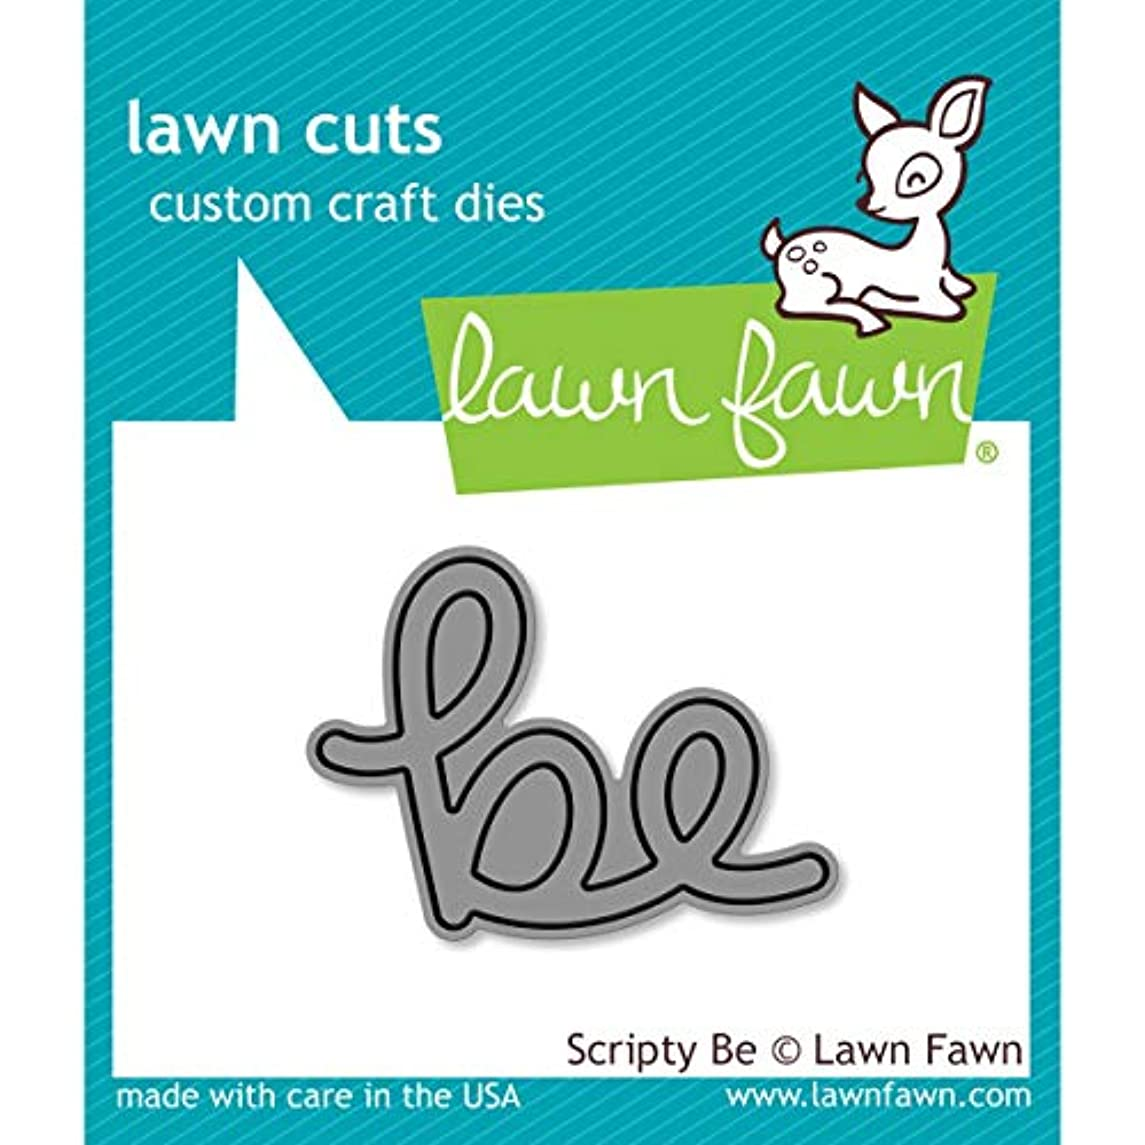 Lawn Fawn Lawn Cuts Craft Die - LF1266 Scripty Be